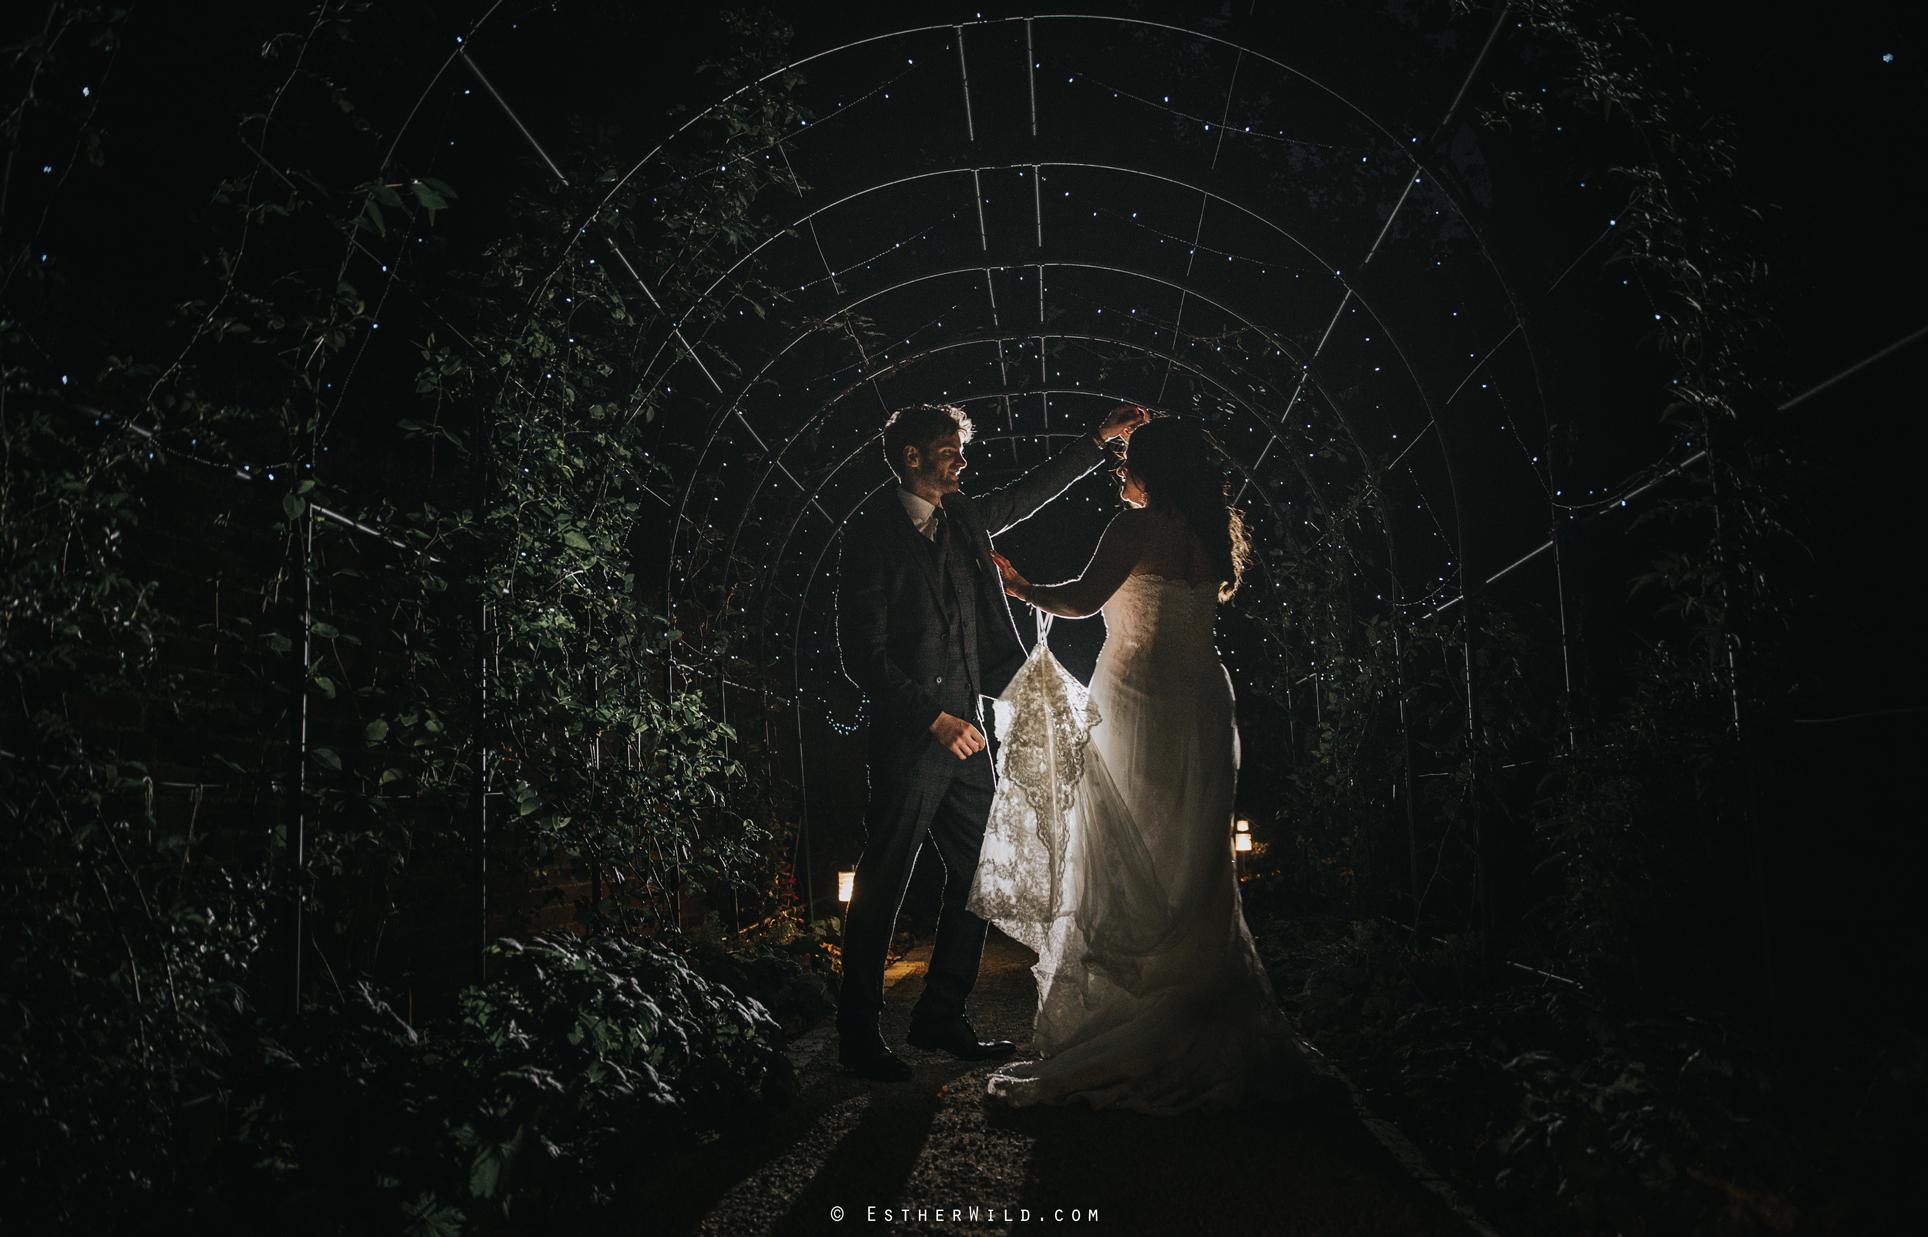 Reading_Room_Weddings_Alby_Norwich_Photographer_Esther_Wild_IMG_2972.jpg